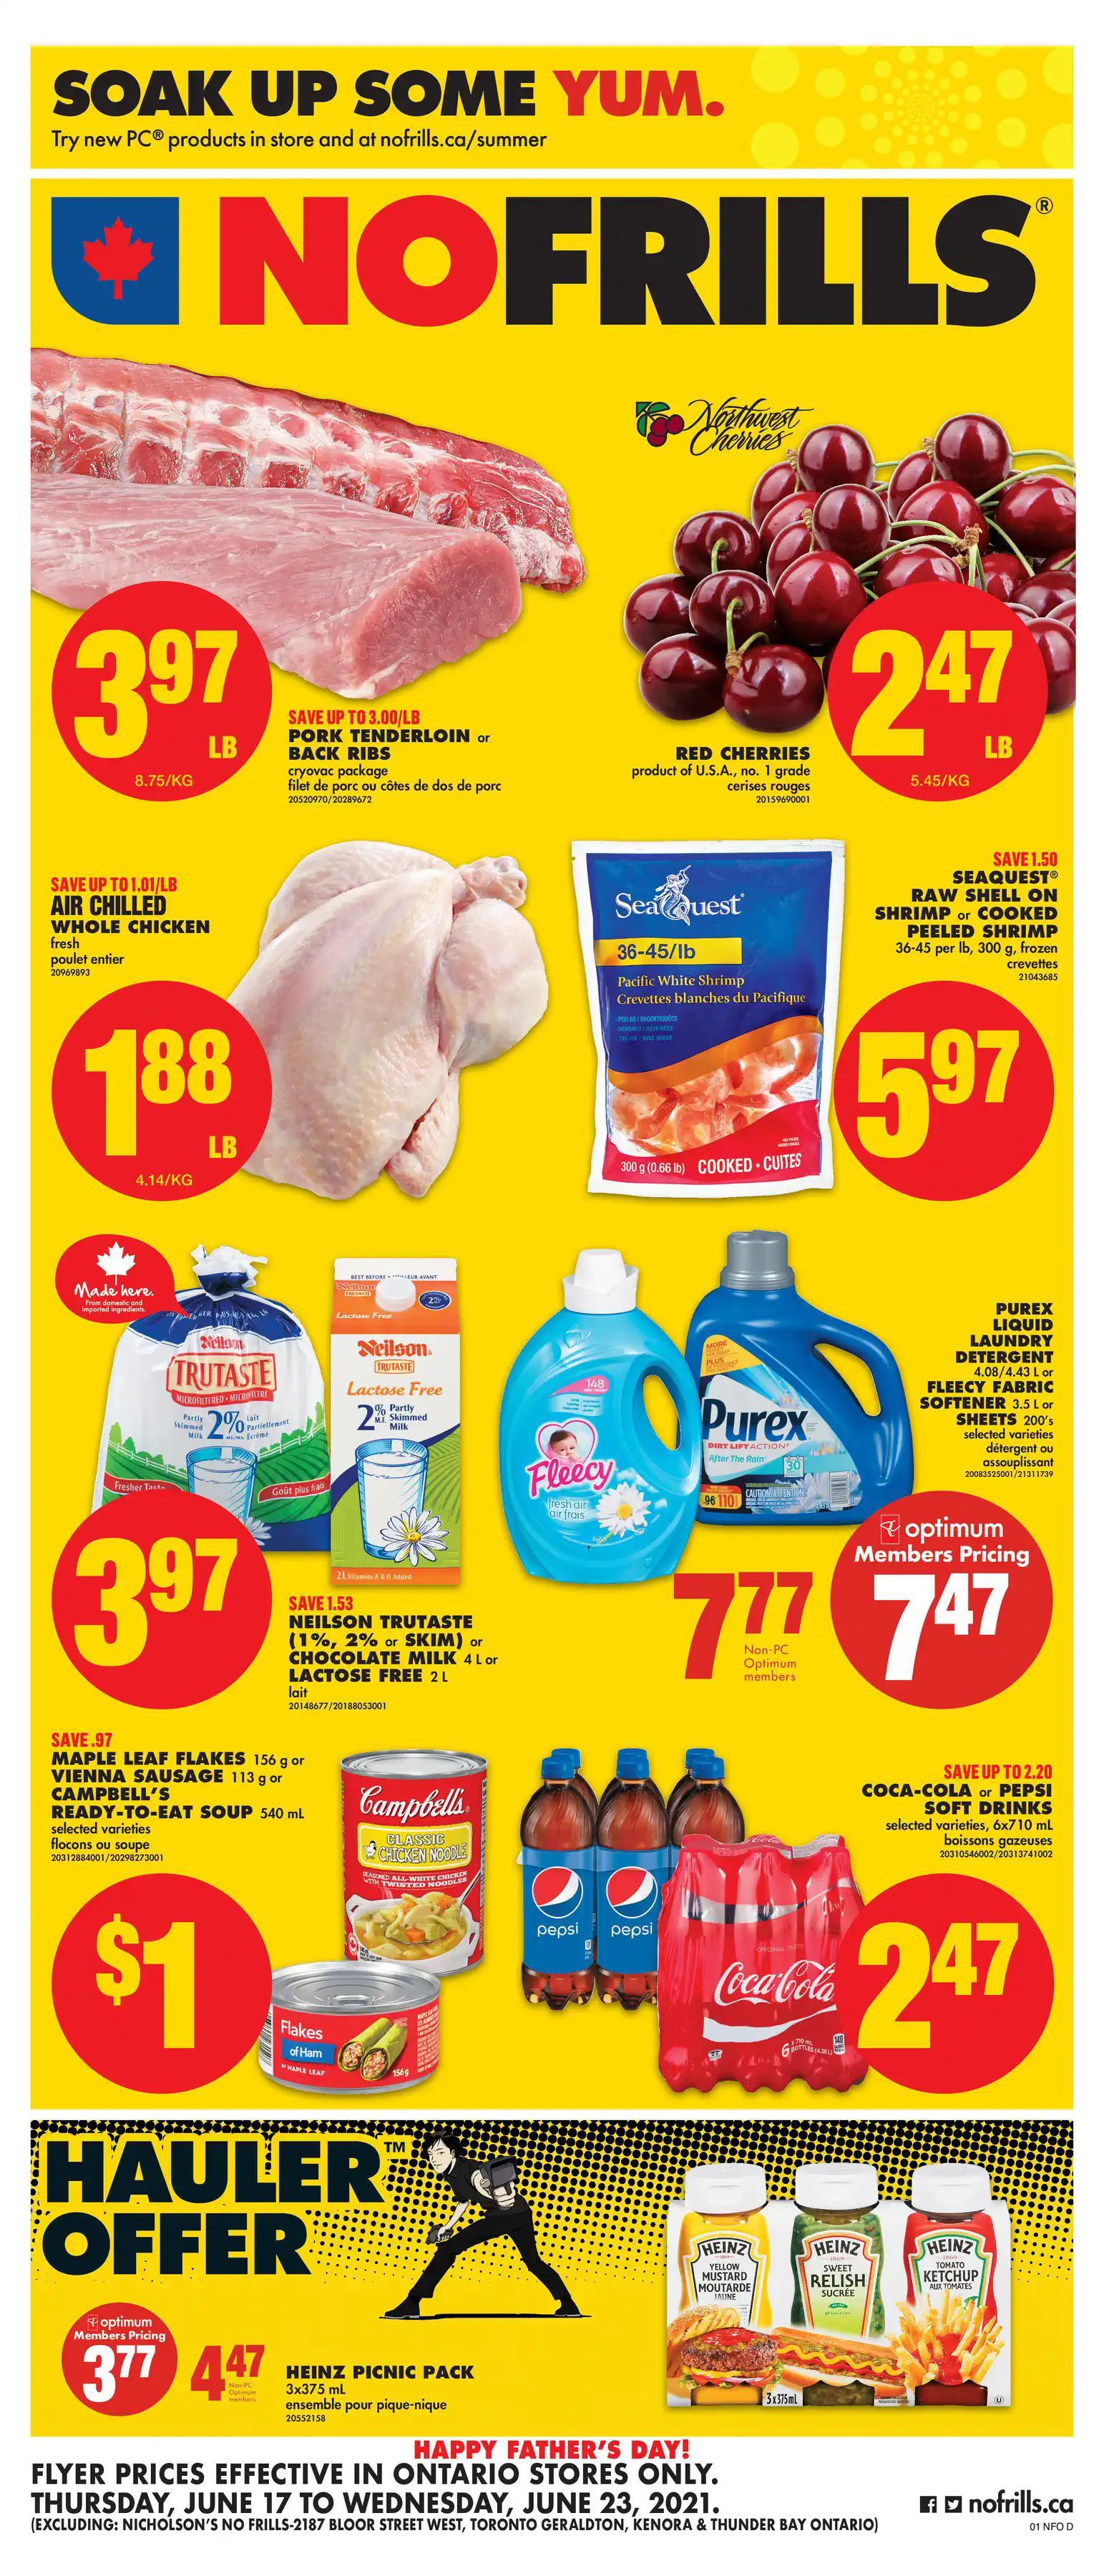 No Frills - Weekly Flyer Specials